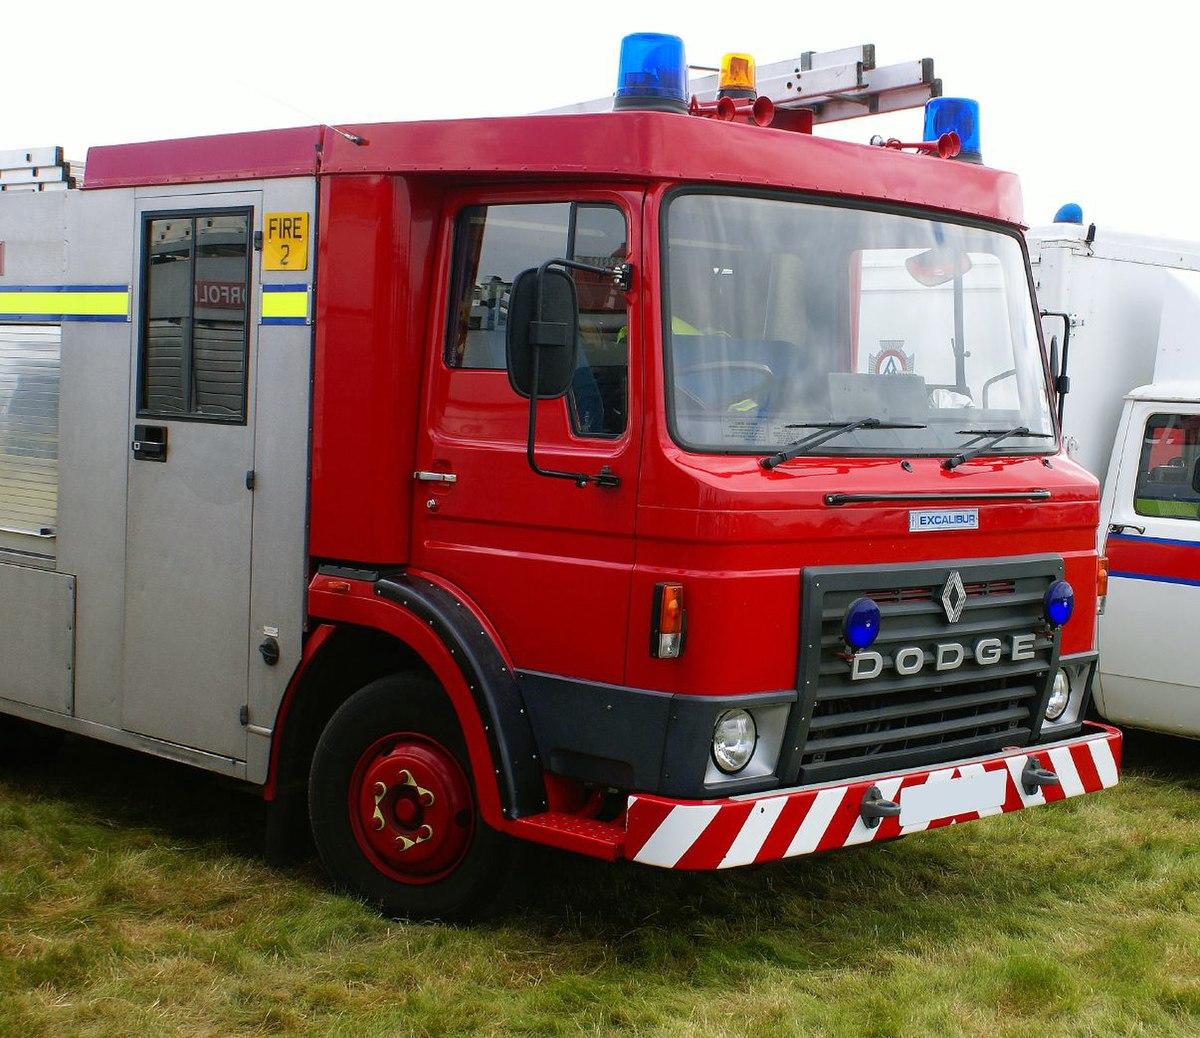 dodge fire engines File:Dodge 2 UK fire engine.jpg - Wikimedia Commons